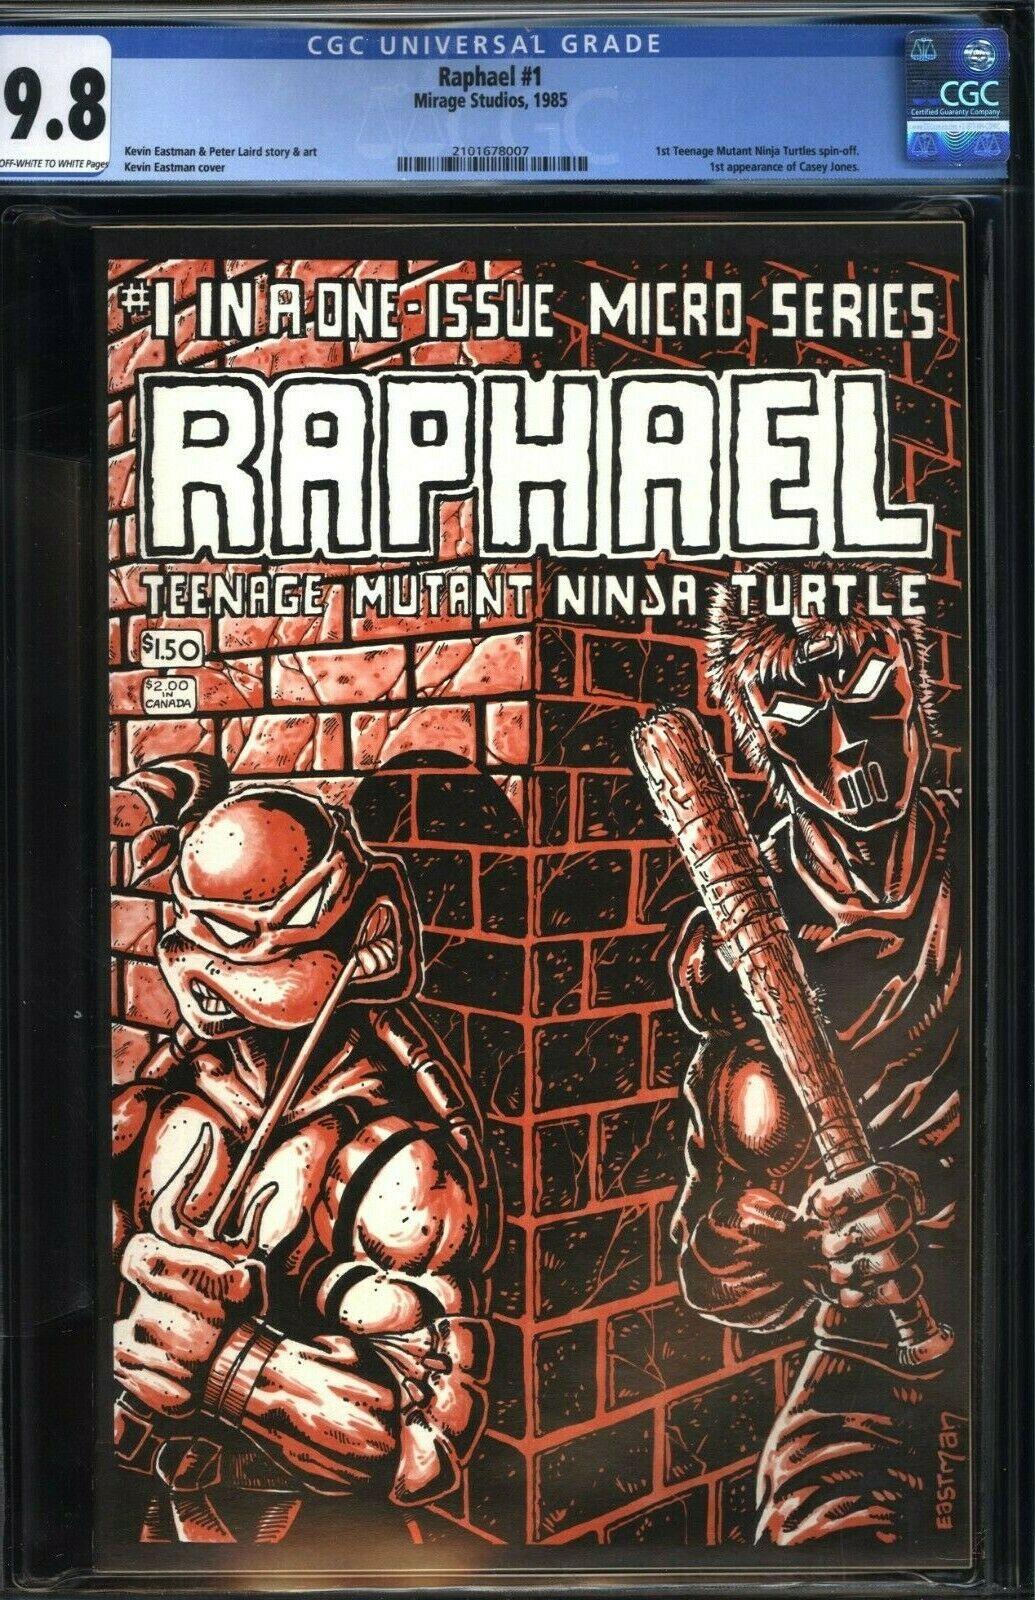 Raphael 1  CGC 98 OWW NMMT  Mirage Studious 1985  1st appearance CASEY JONES